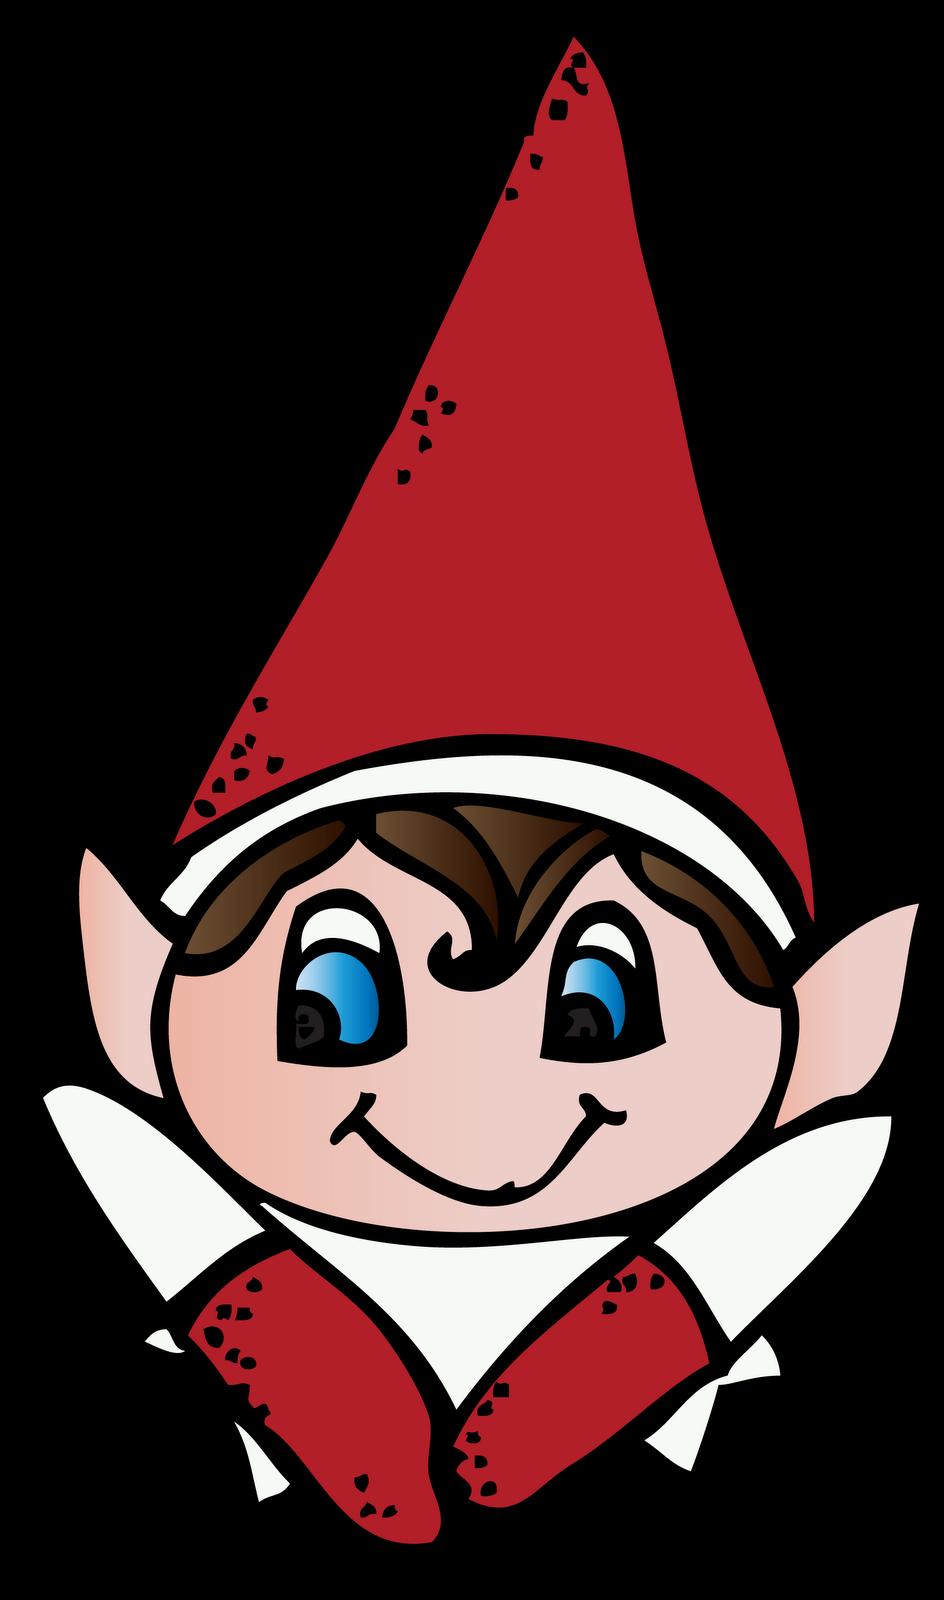 944x1600 Elf On The Shelf Clipart